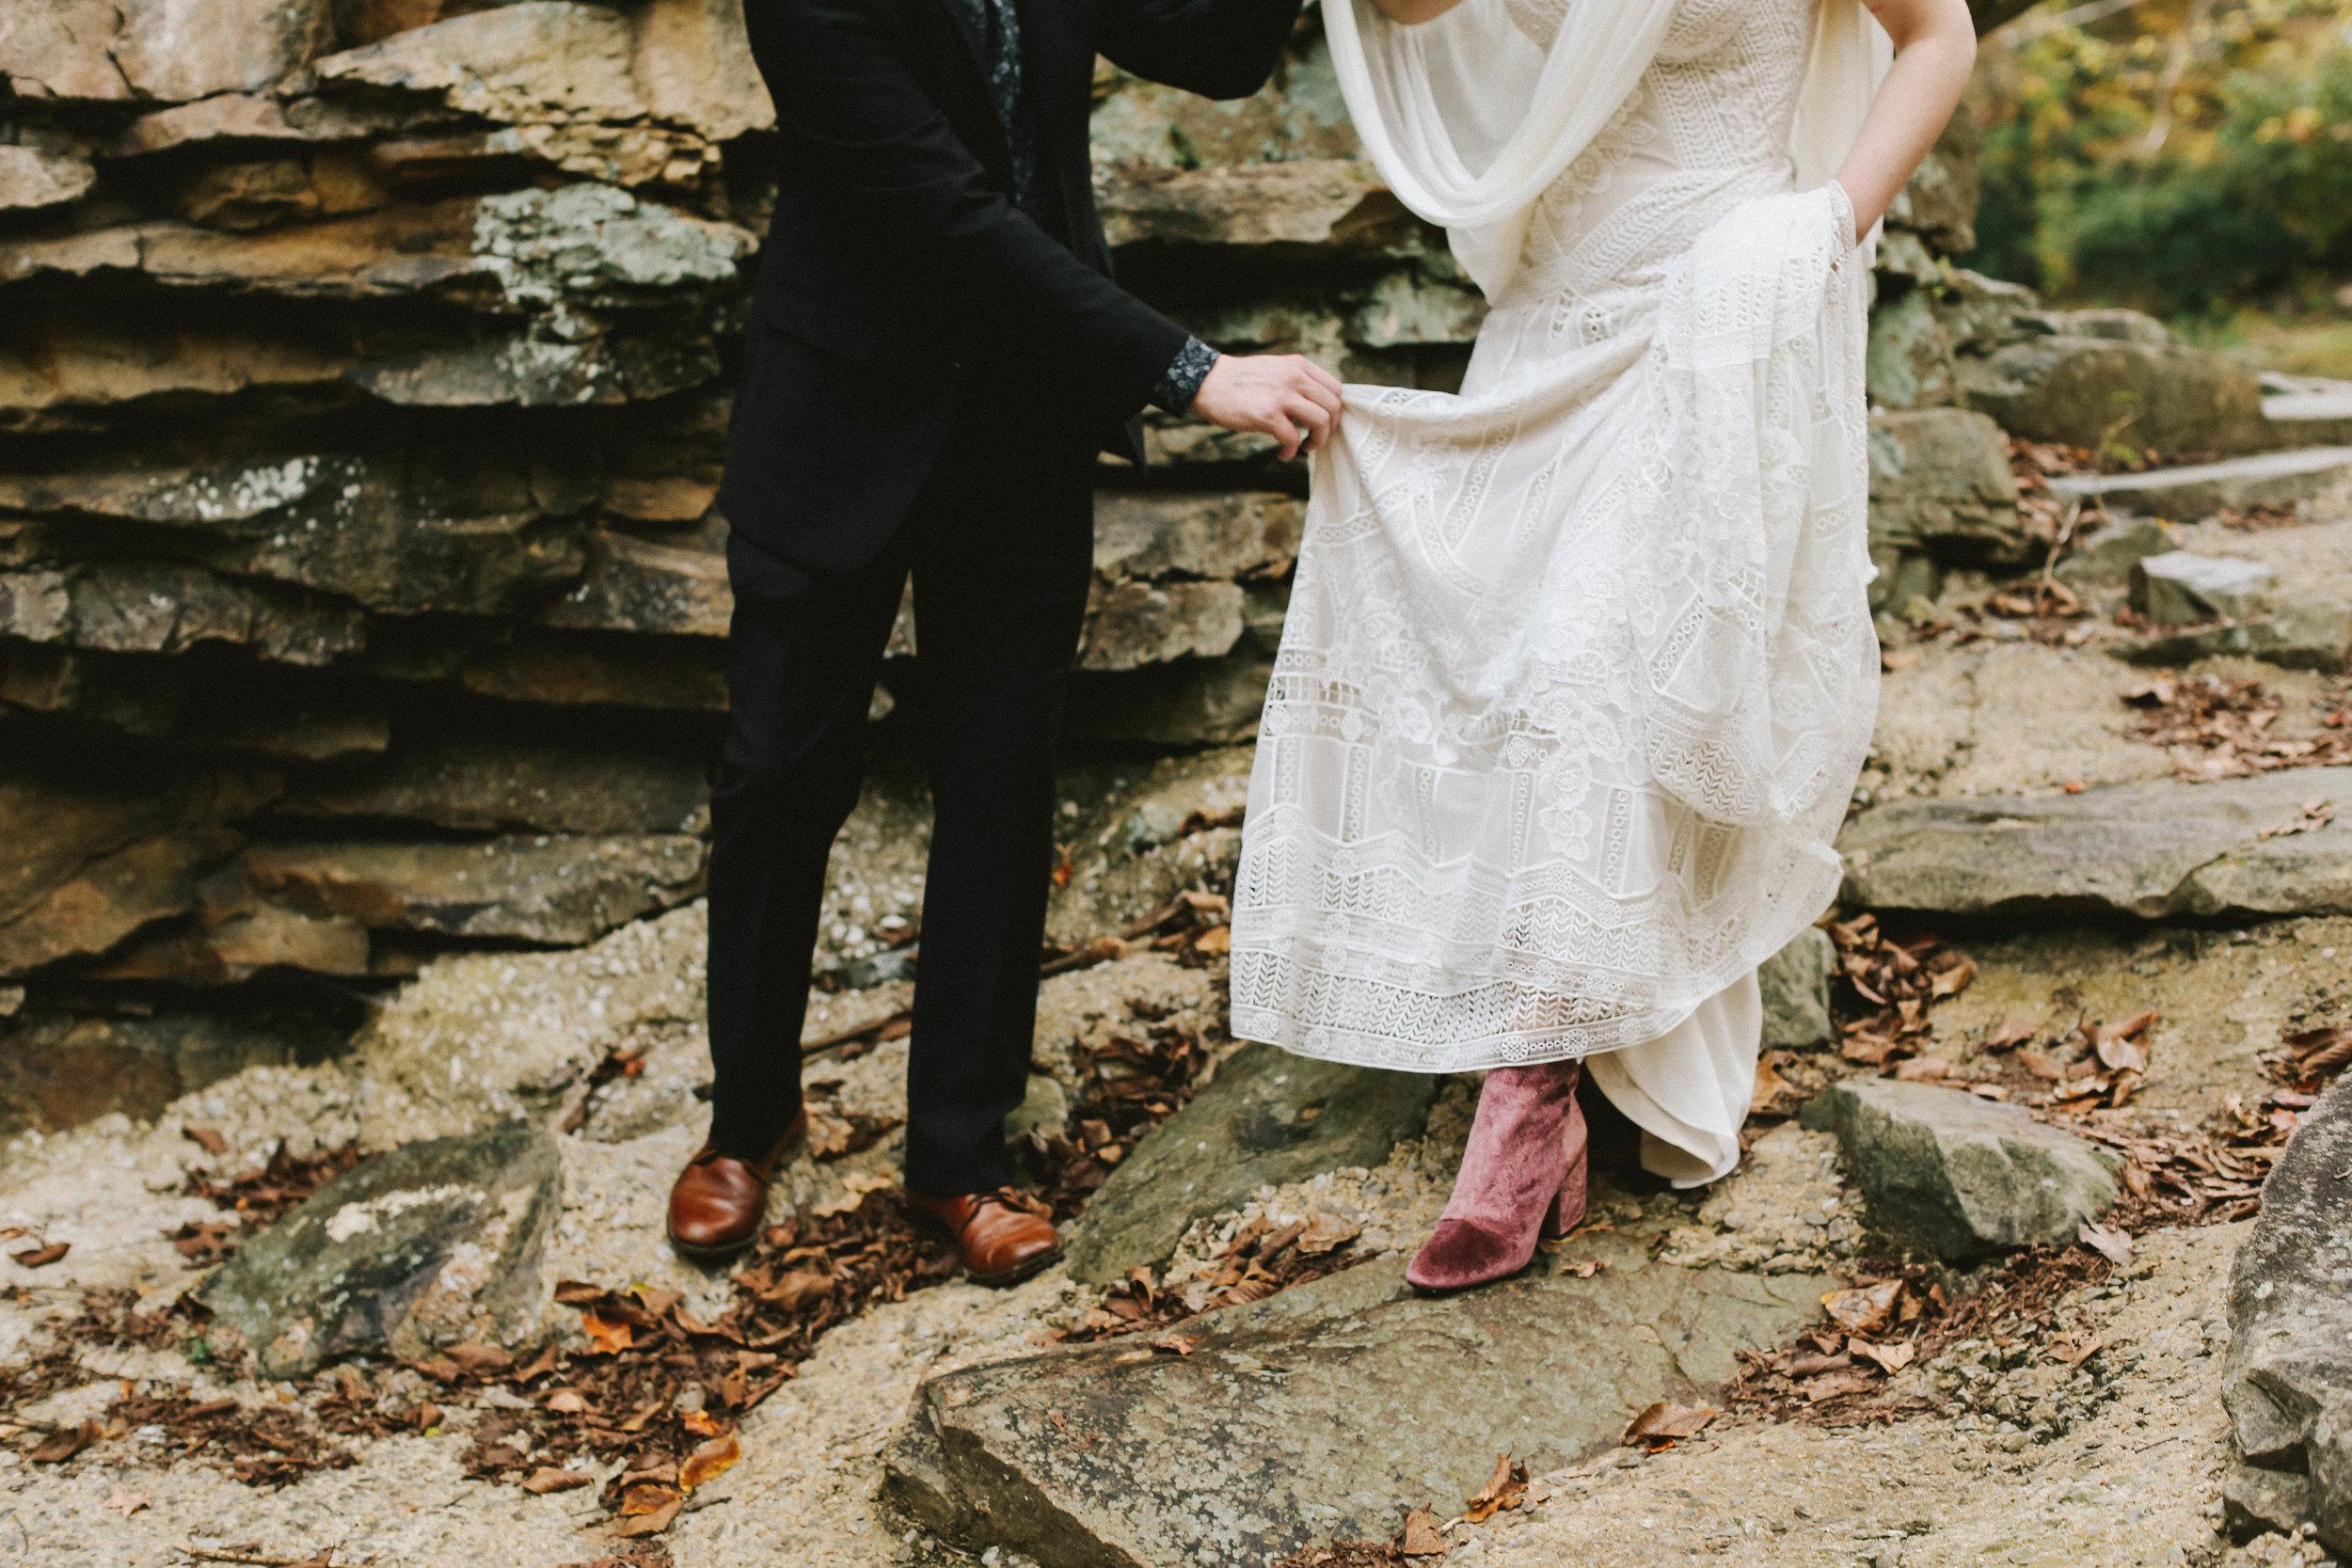 Folky Autumn Wedding Shoot - Rock and Roll Fall Wedding Ideas